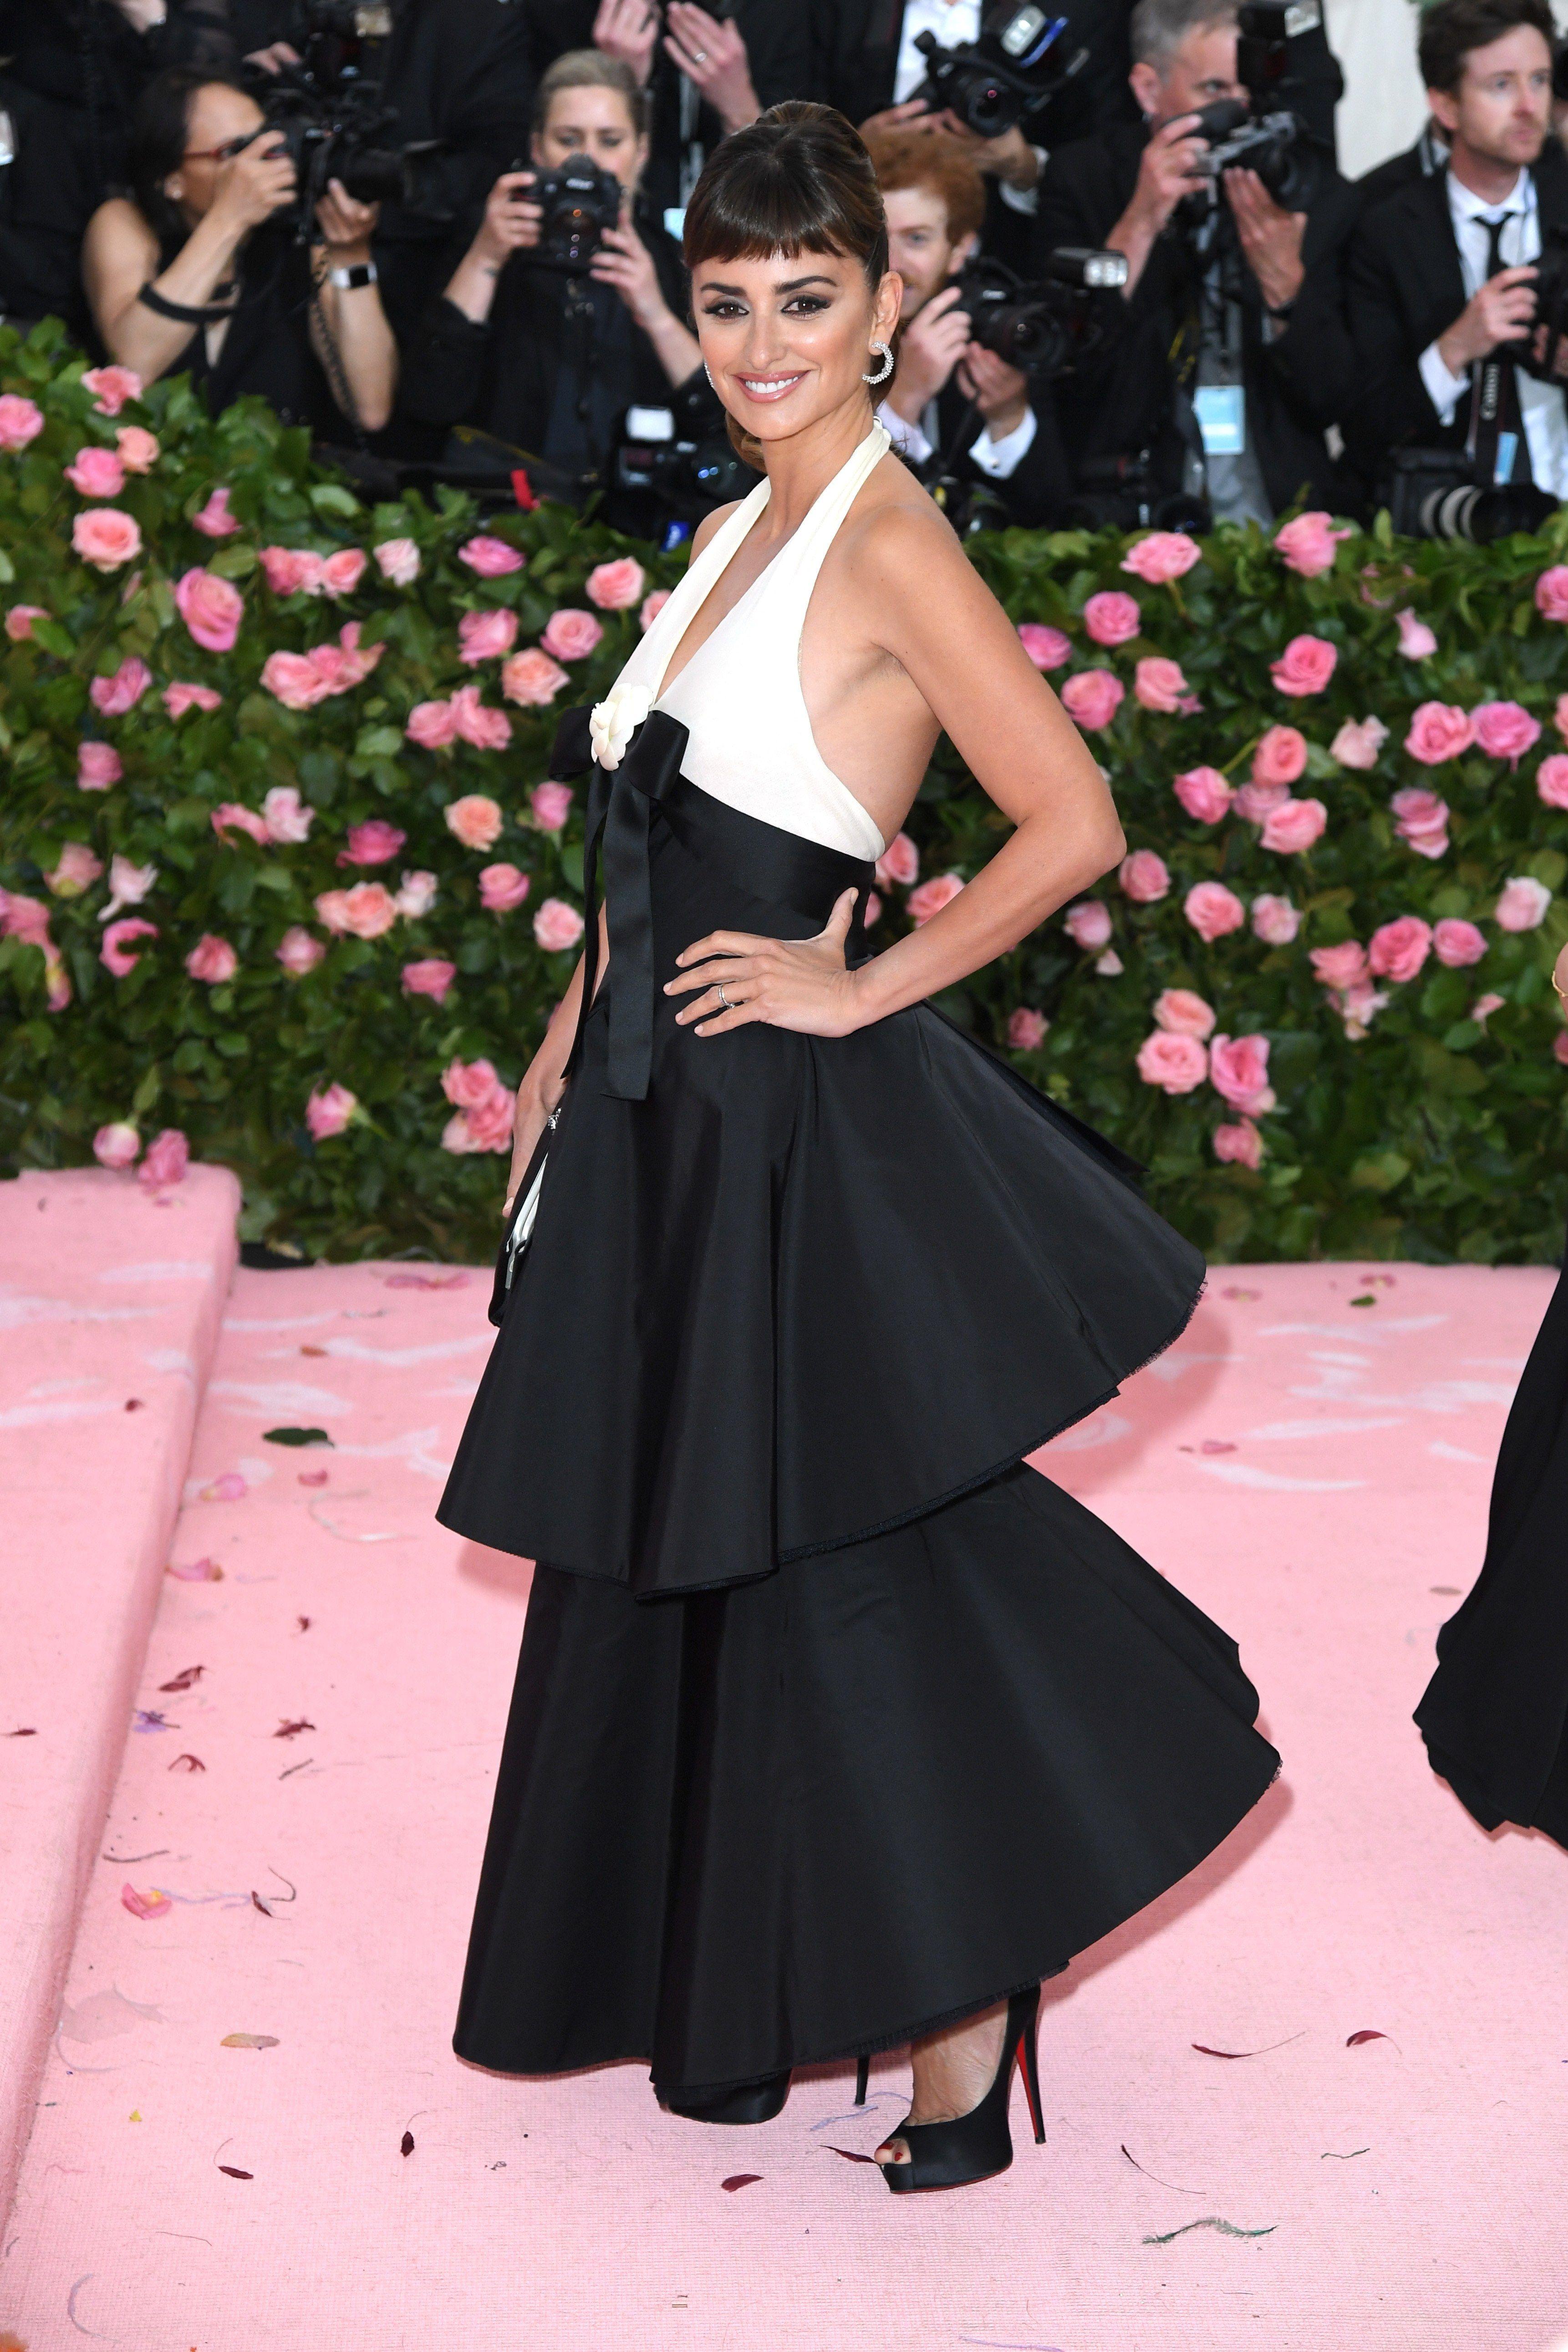 Met Gala 2019 Red Carpet See All The Celebrity Dresses Outfits And Looks Here Met Gala Looks Celebrity Dresses Met Gala